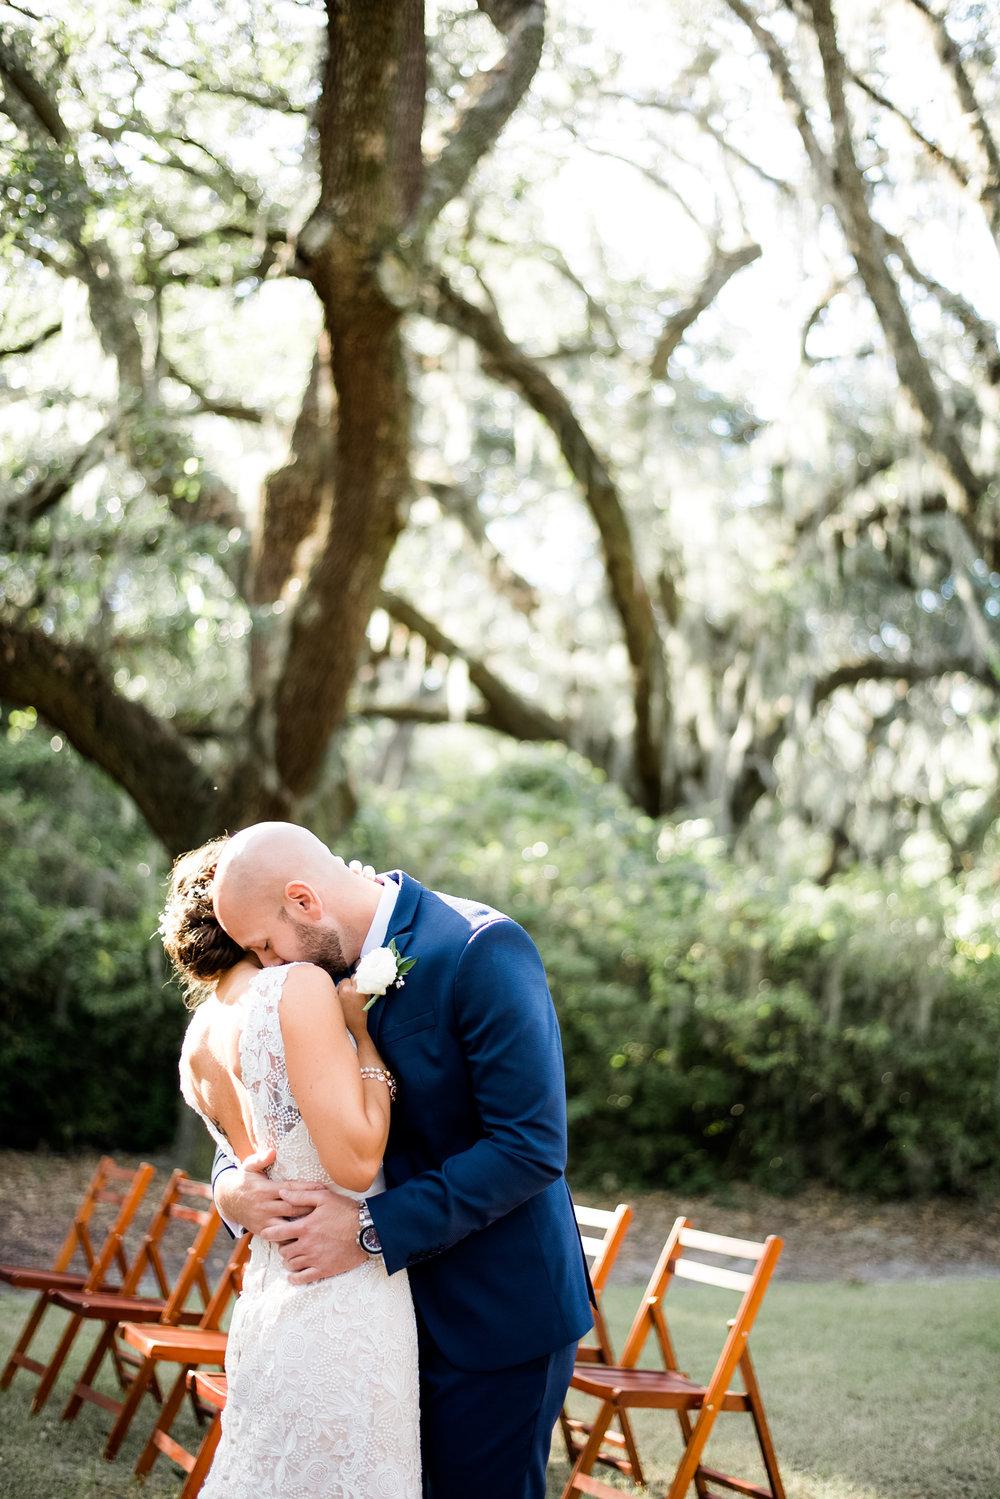 LAUREN + DAVID | CHARLESTON WEDDINGS-30.JPG